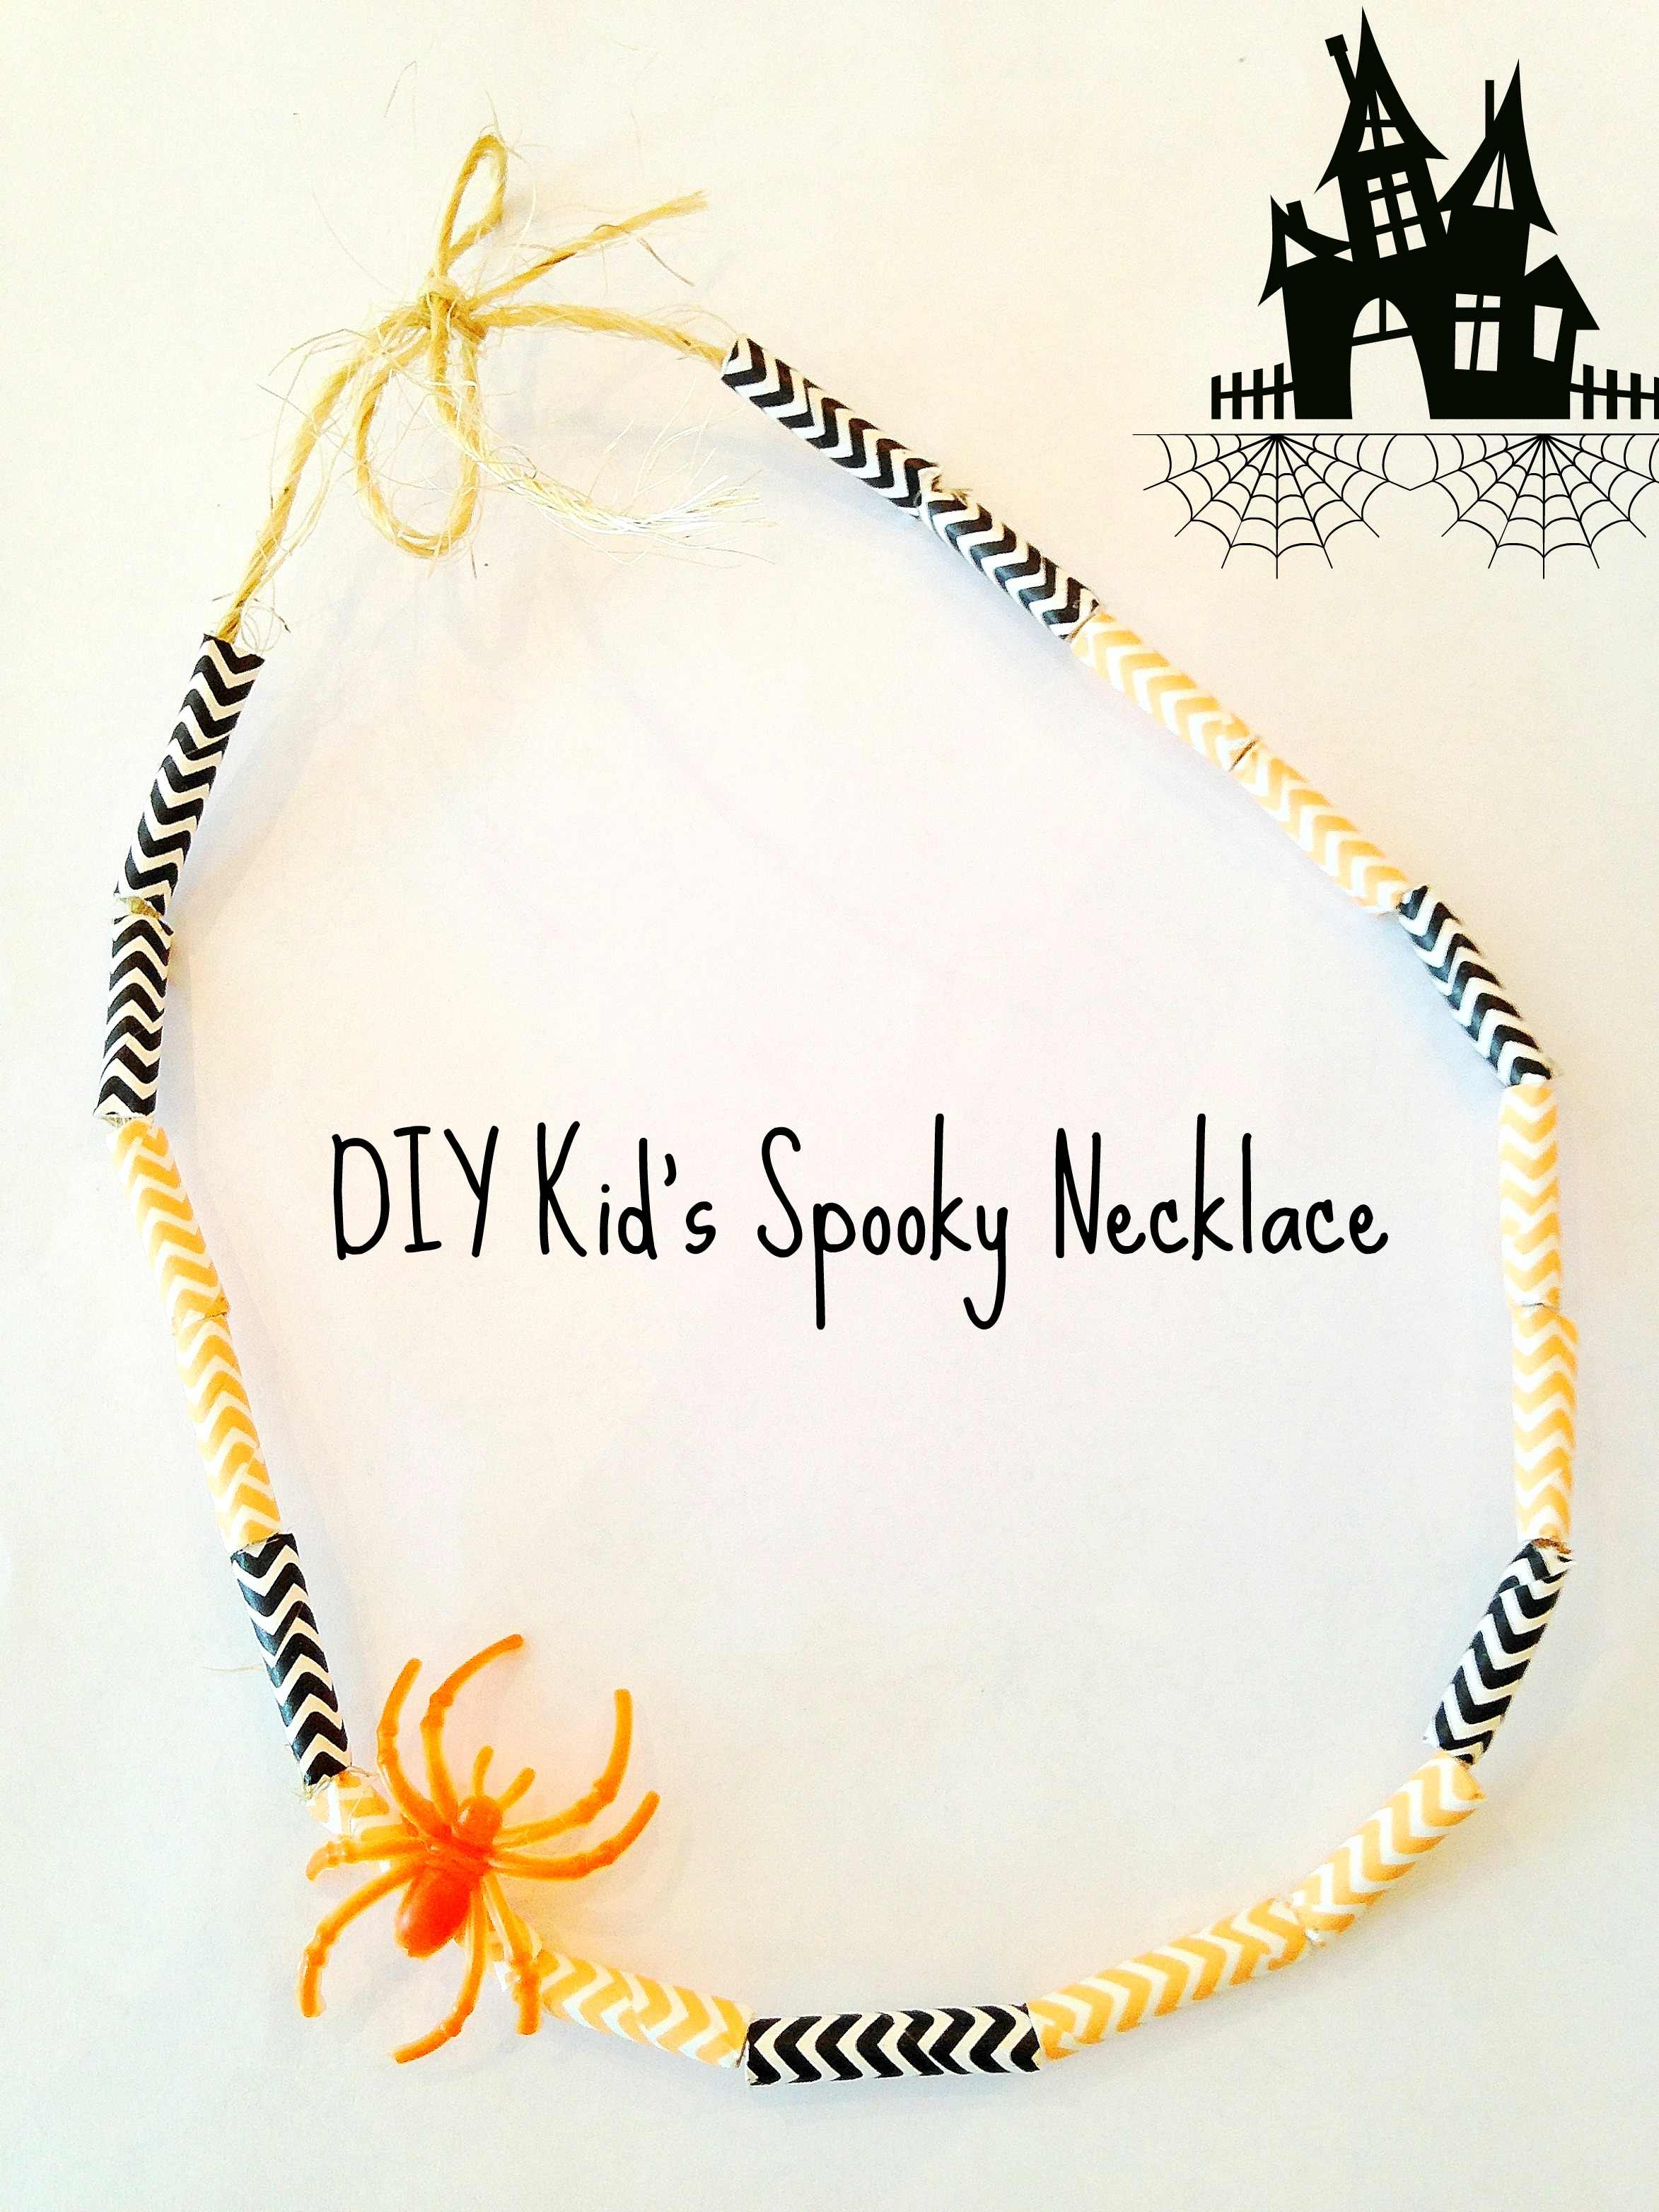 DIY Halloween Spooky Straw Necklace